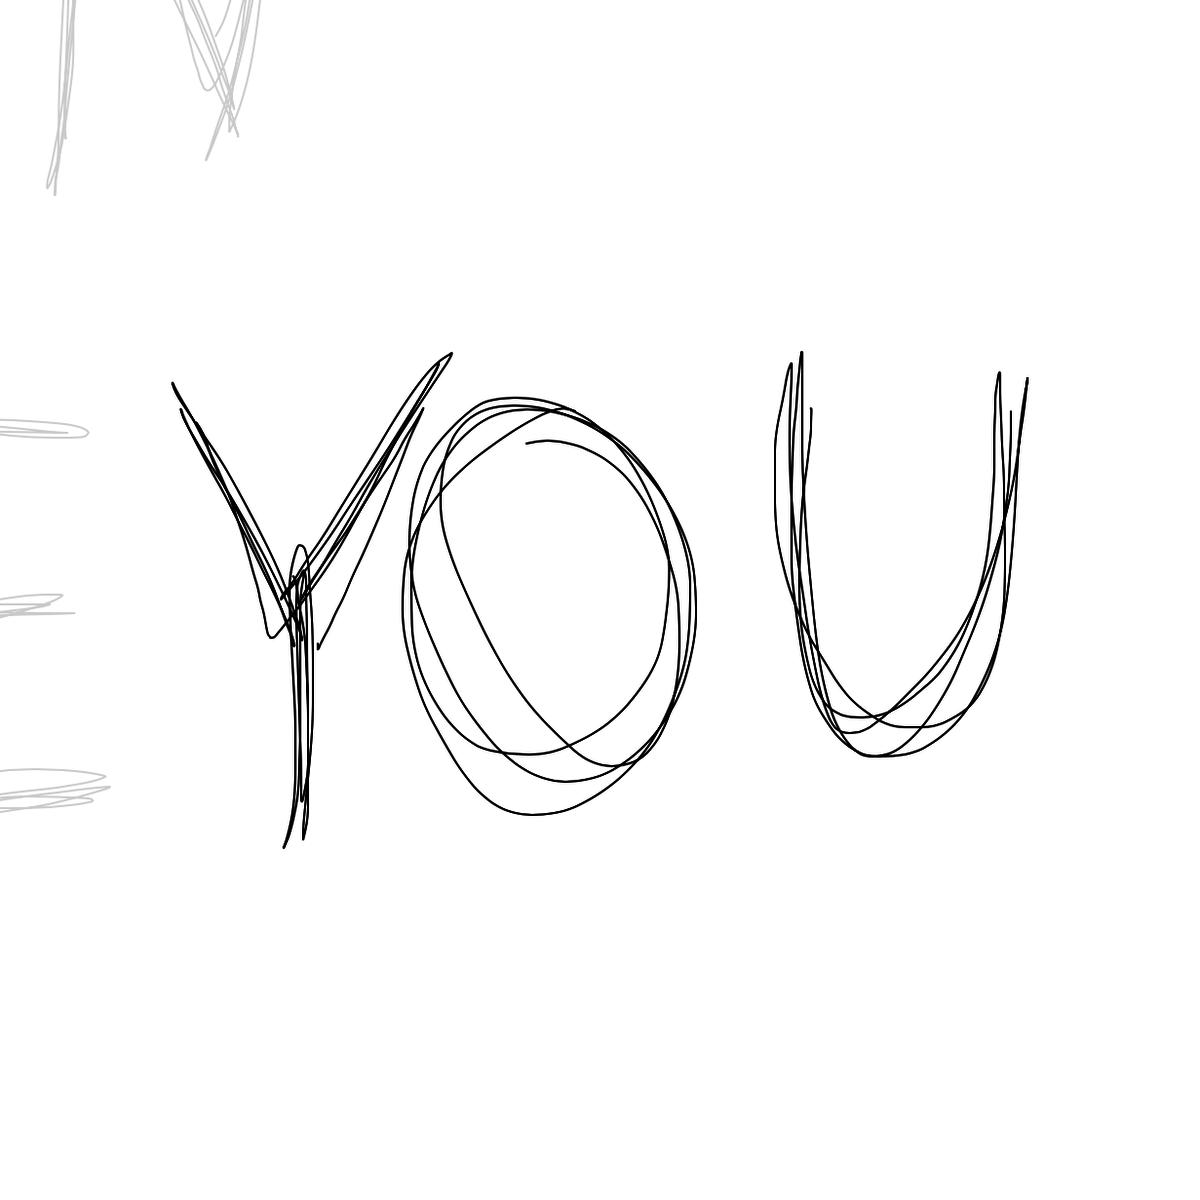 BAAAM drawing#22869 lat:47.2371520996093750lng: -93.5301437377929700